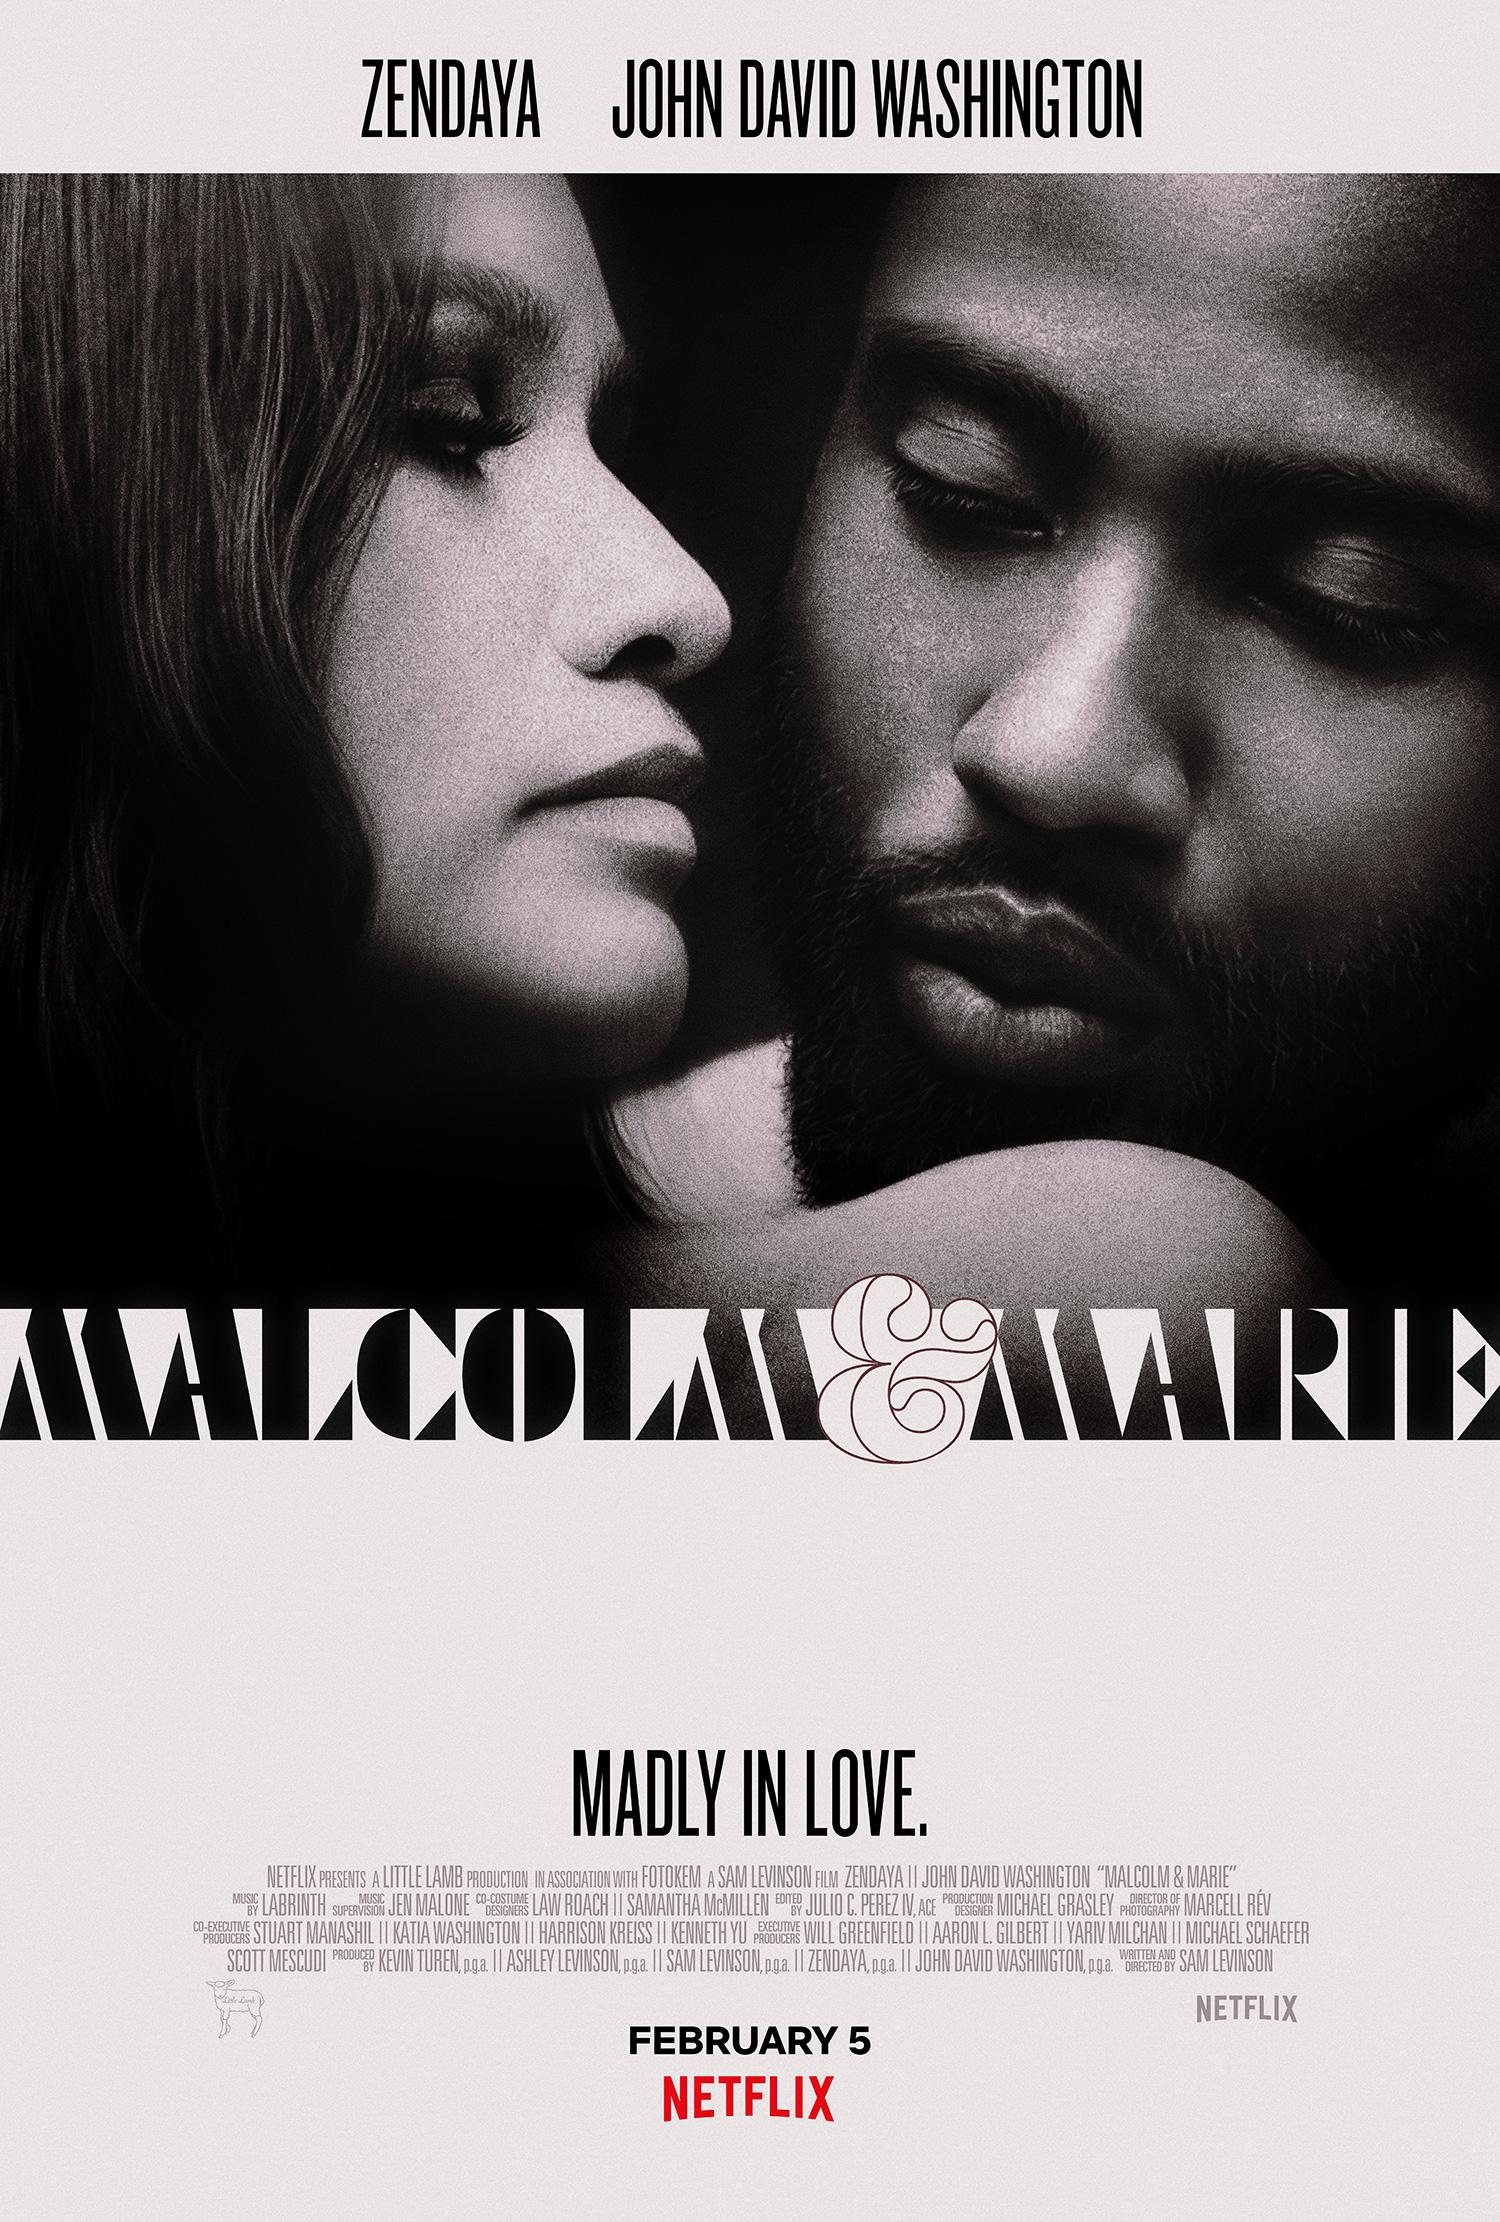 New Movie: Netflix's Malcom And Marie Starring Zendaya & John David Washington